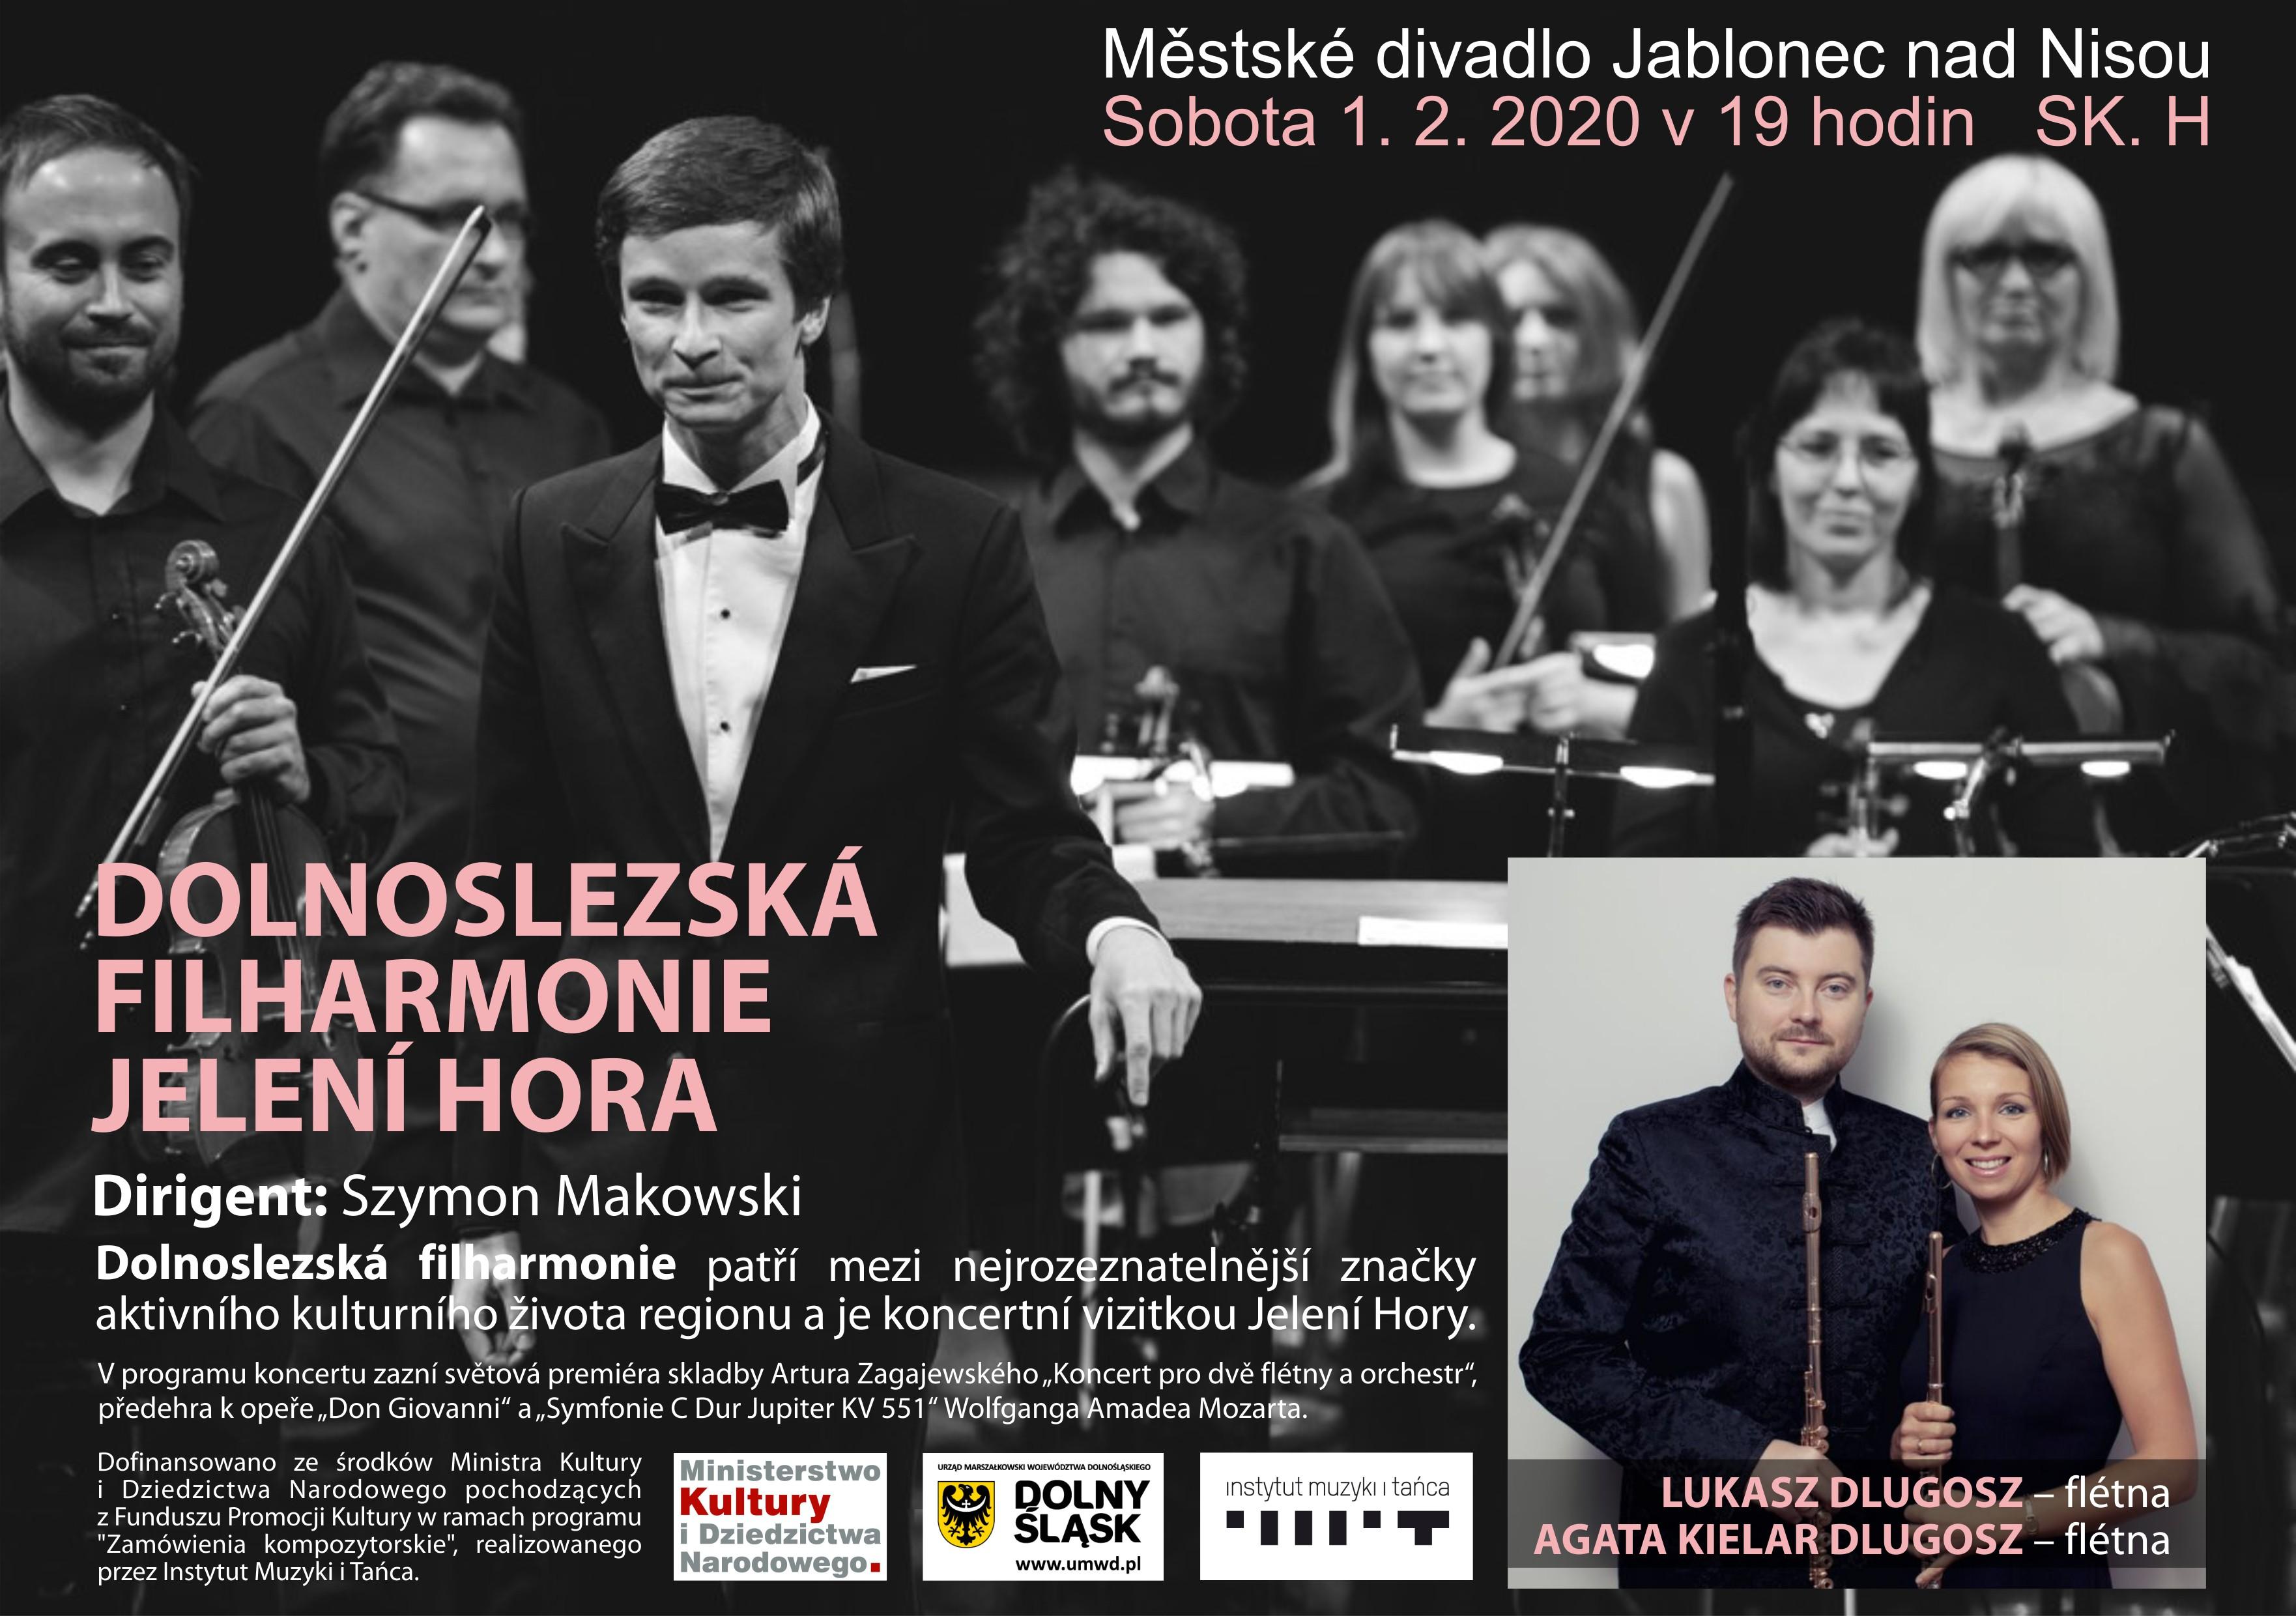 filharmonie-JH2020.jpg (991 KB)